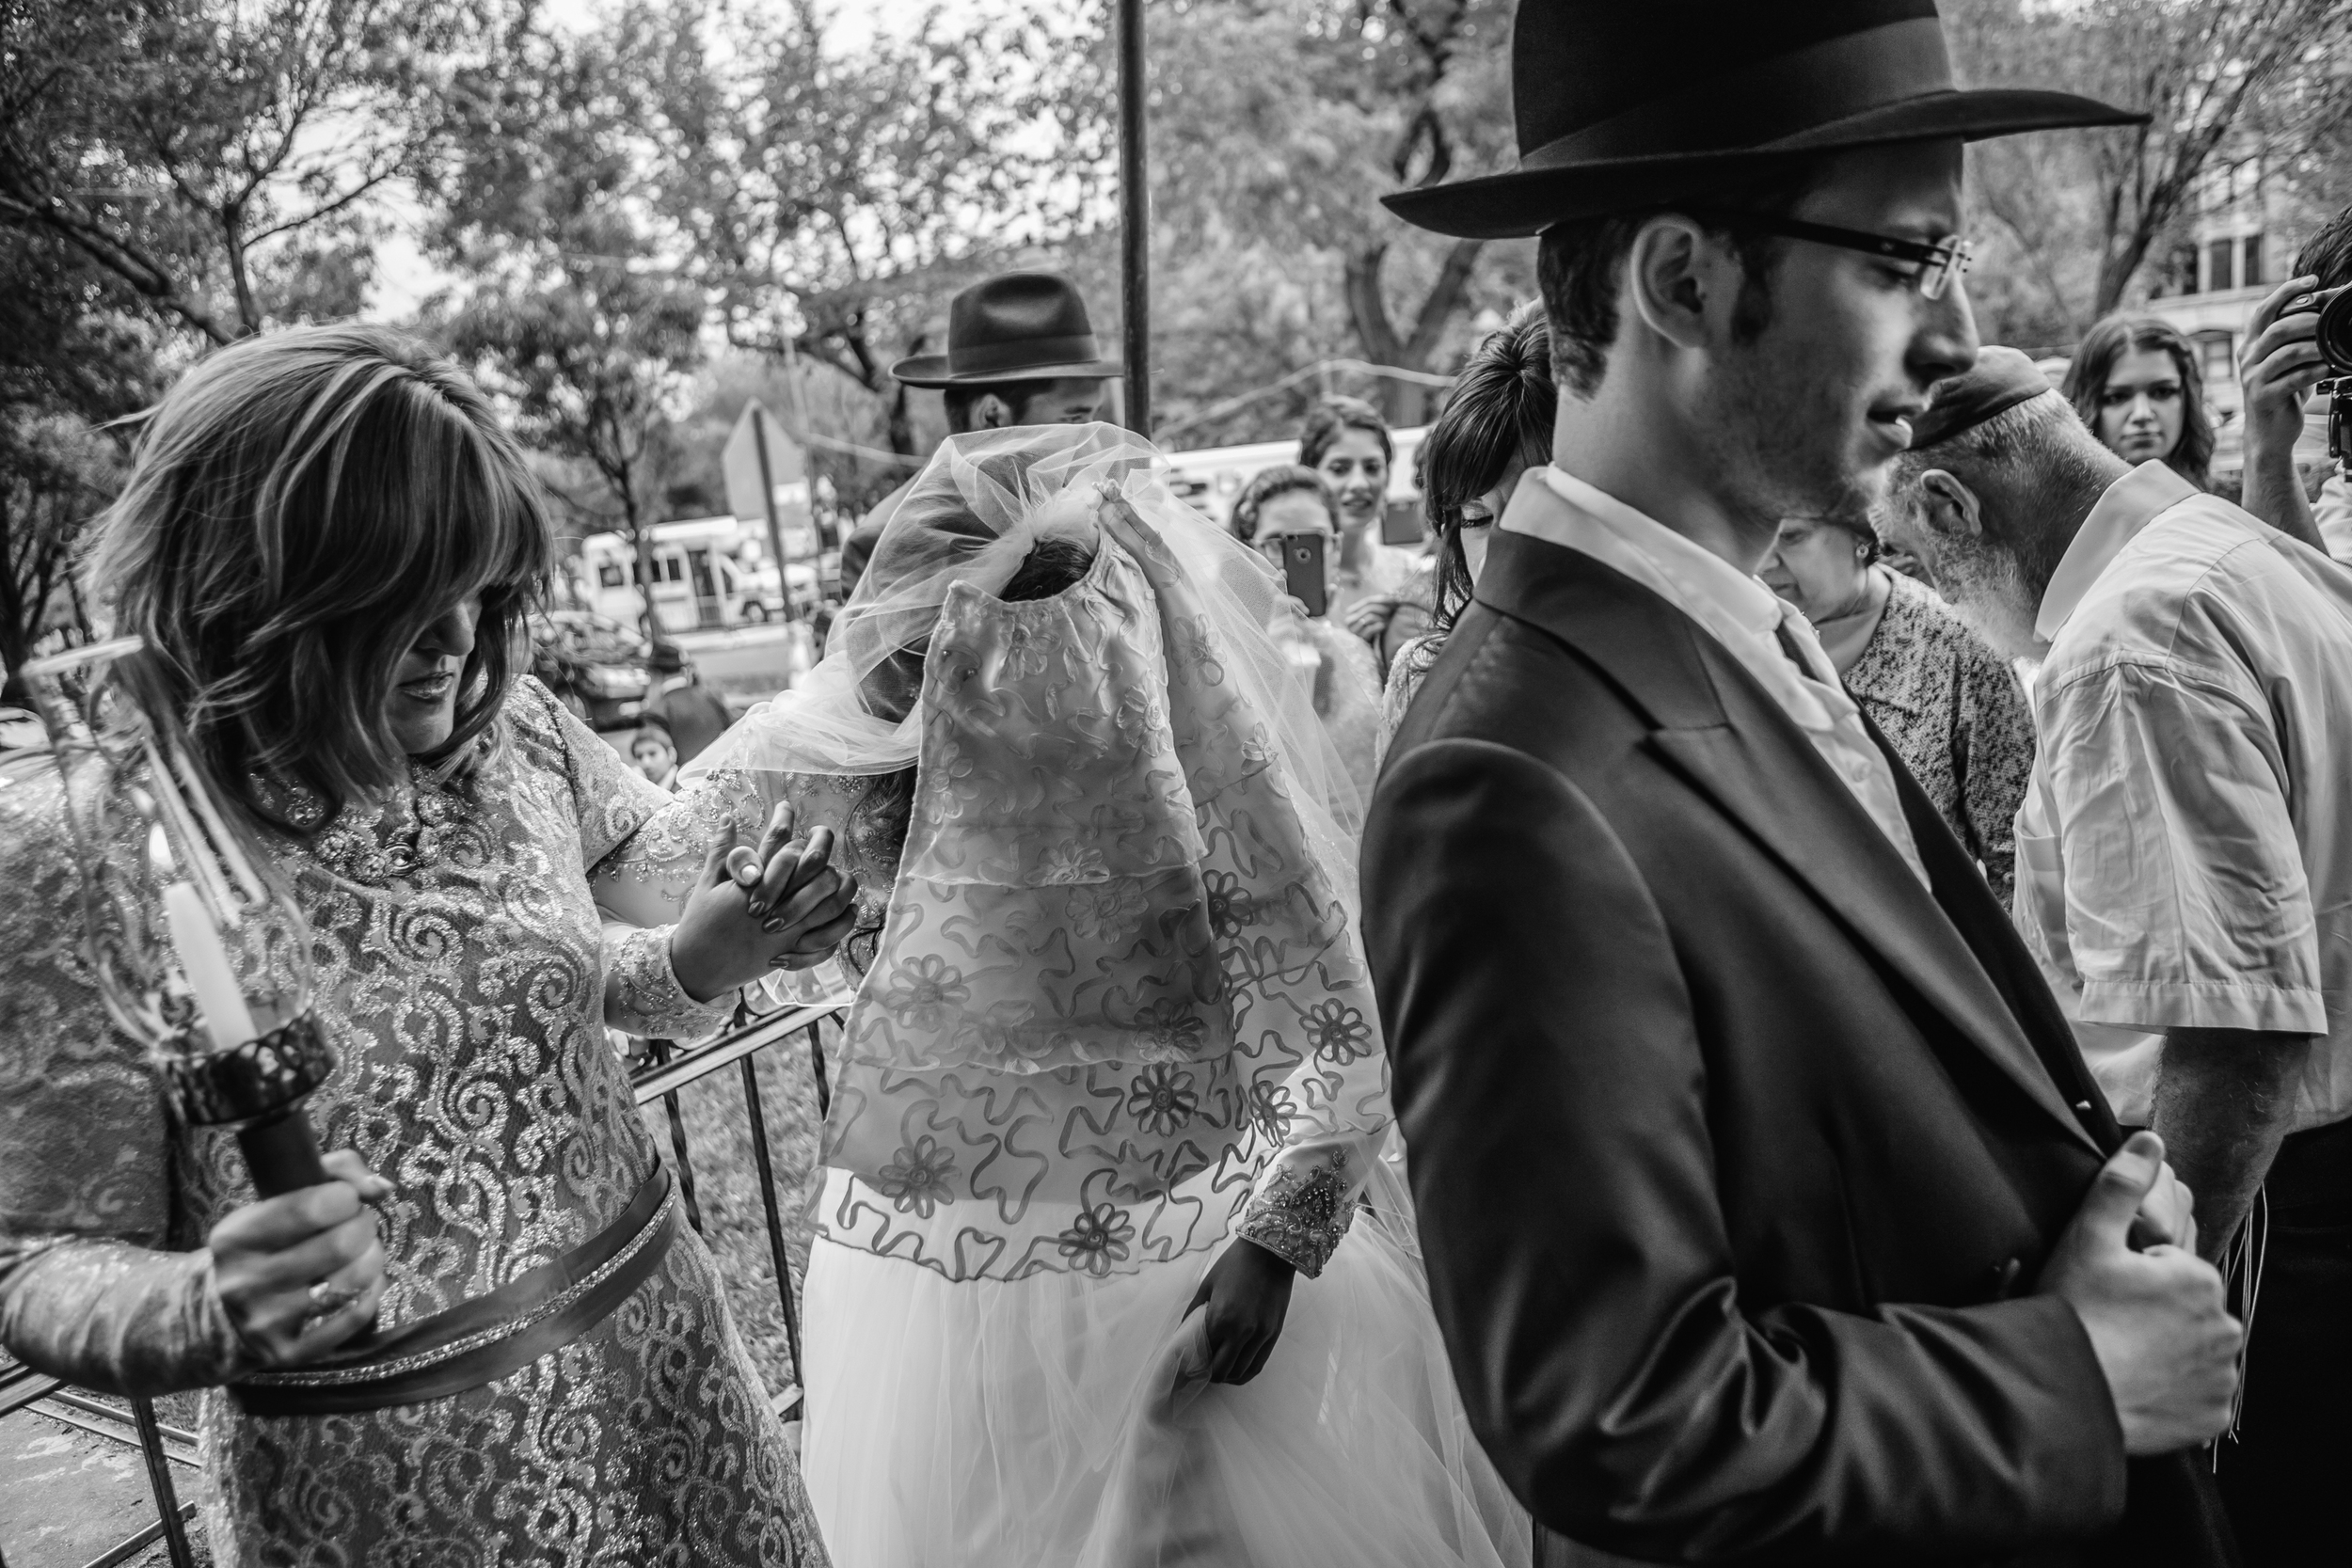 Wedding Iossi and Gitty Khafif  - Eliau Piha studio photography, new york, events, people 770 brooklyn -0420.jpg